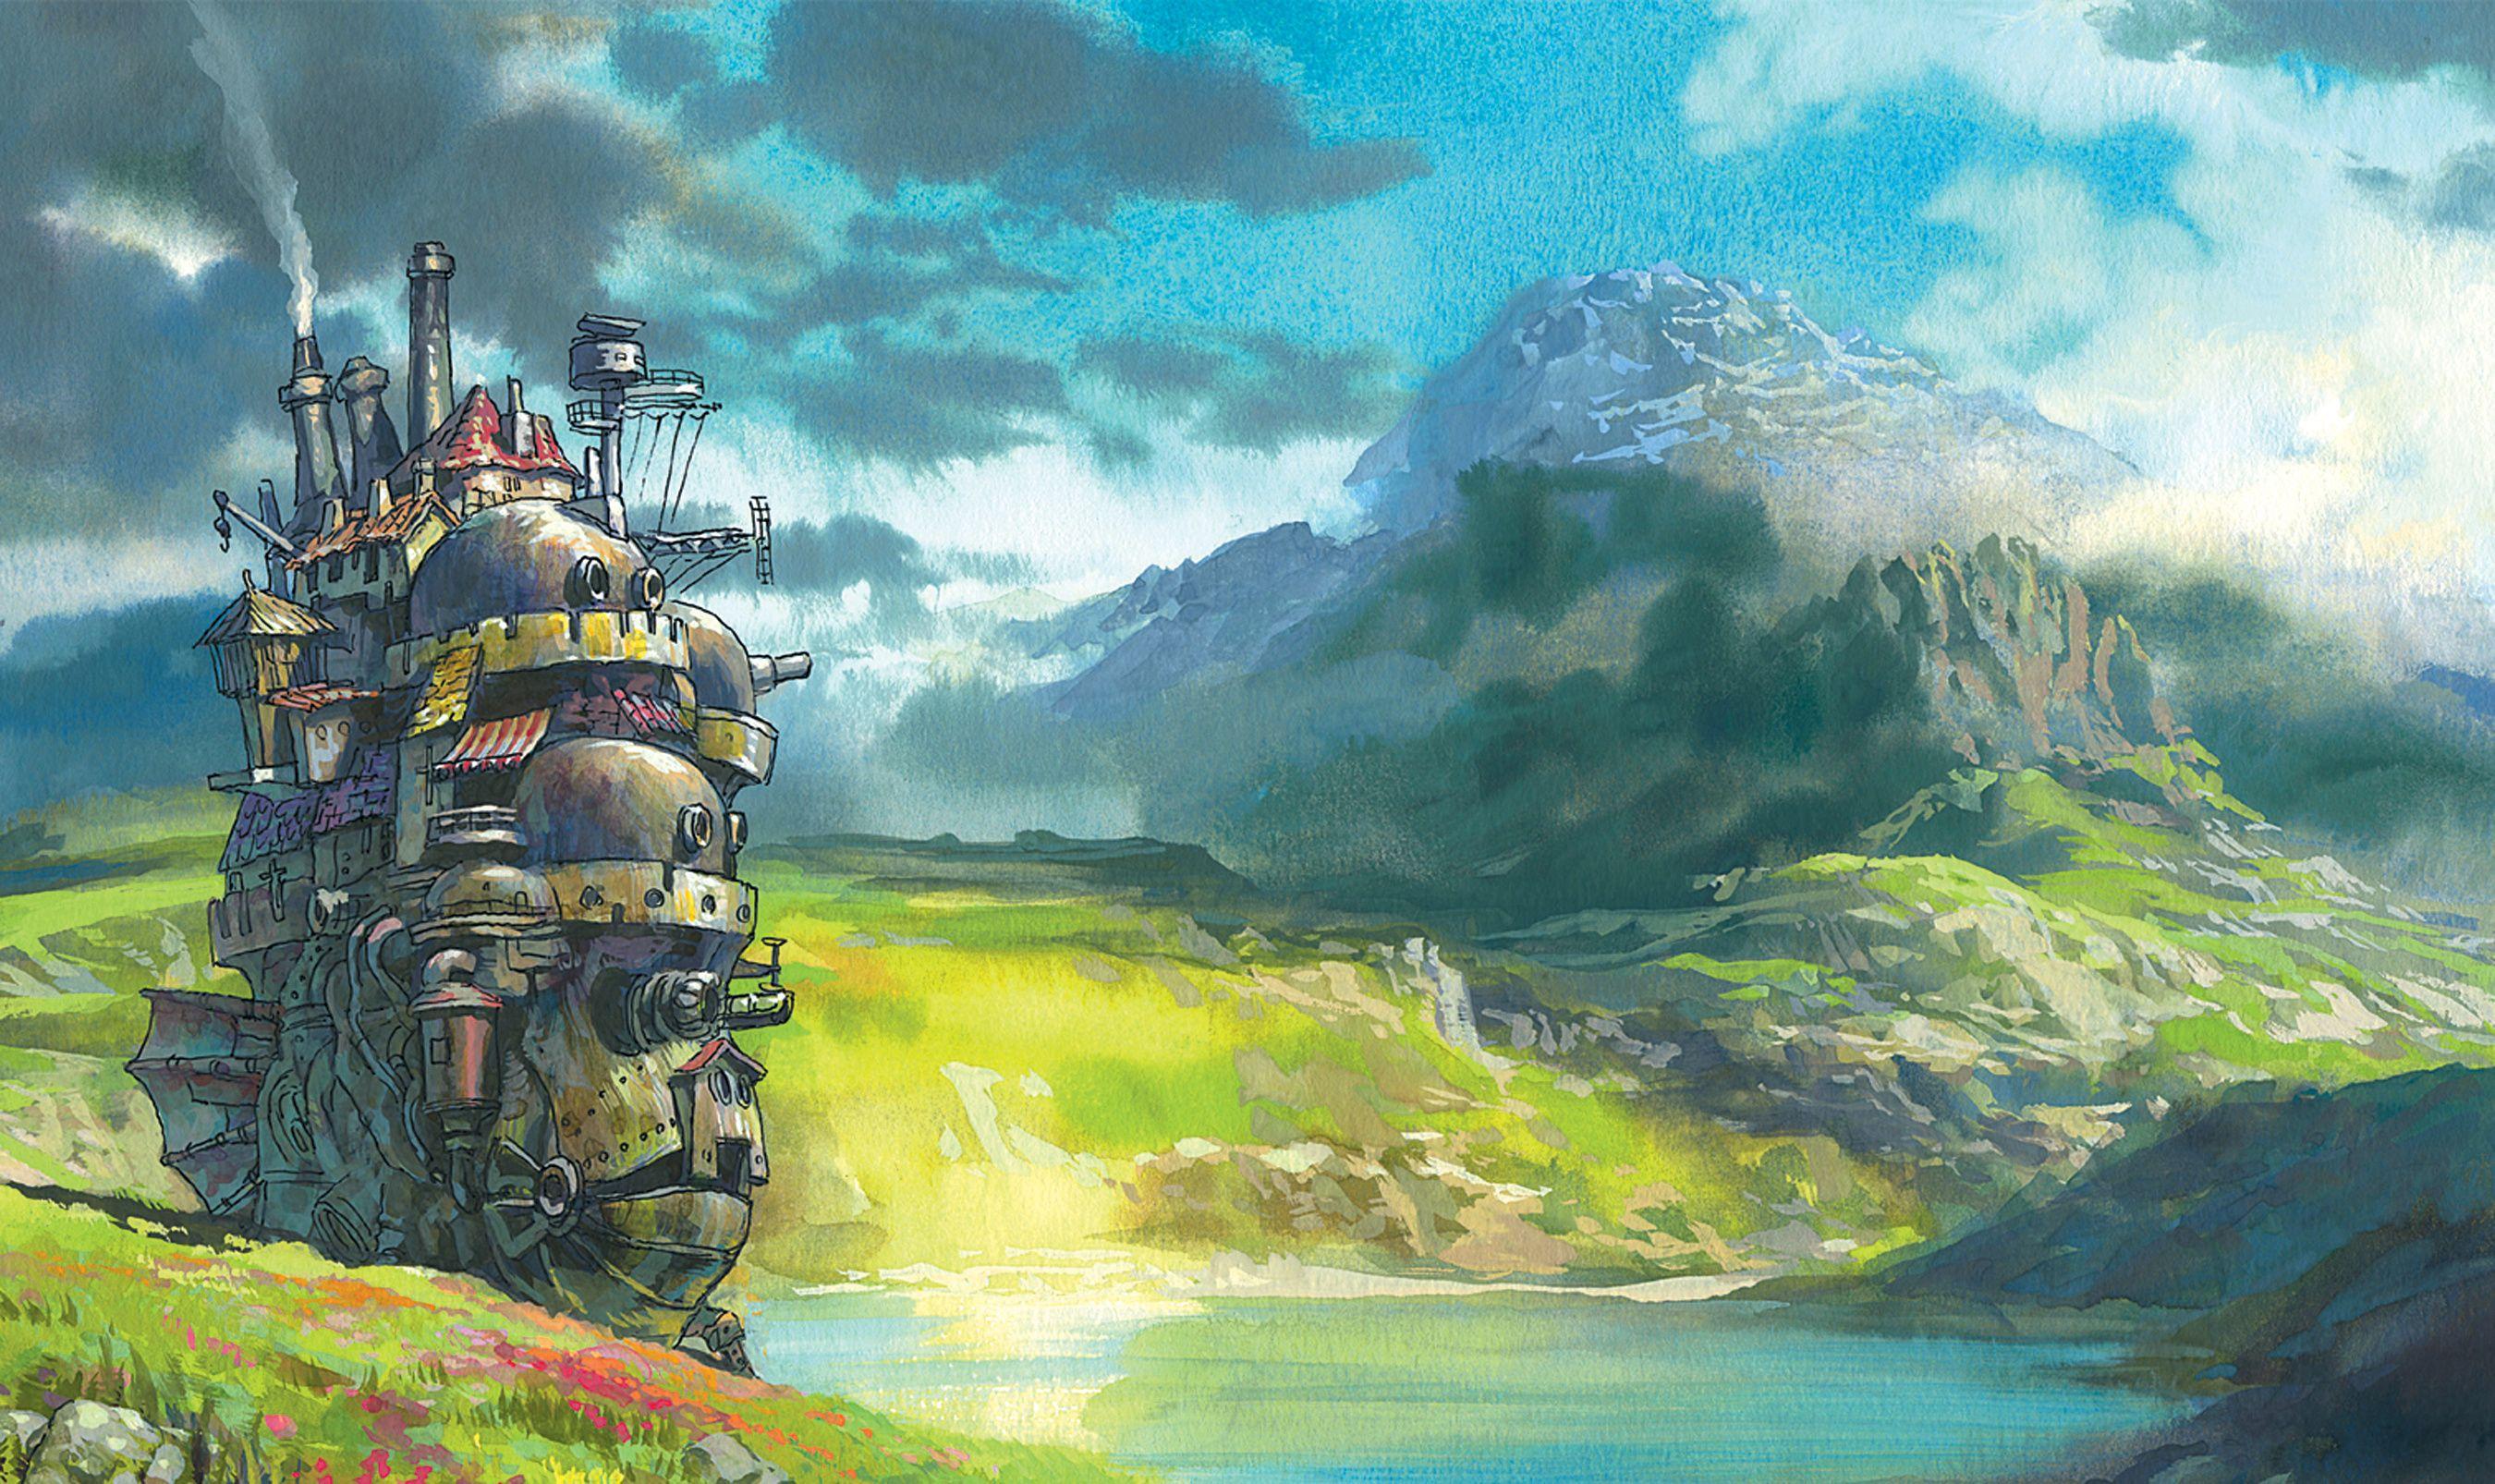 Beautiful (high-resolution) hand-painted scenes from Miyazaki ...